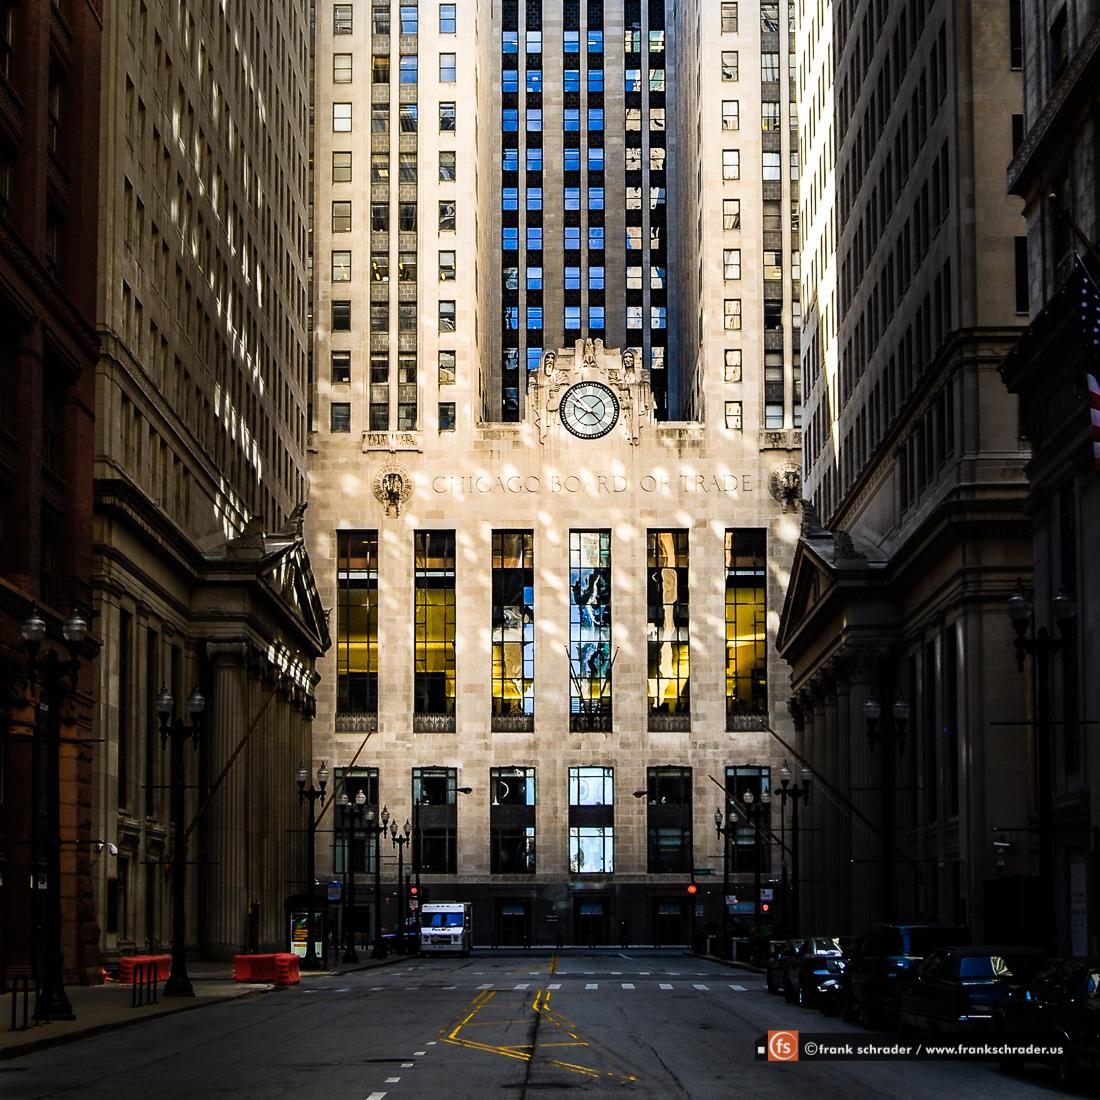 Board of Trade Building in Chicago [photo: frankschrader.us]